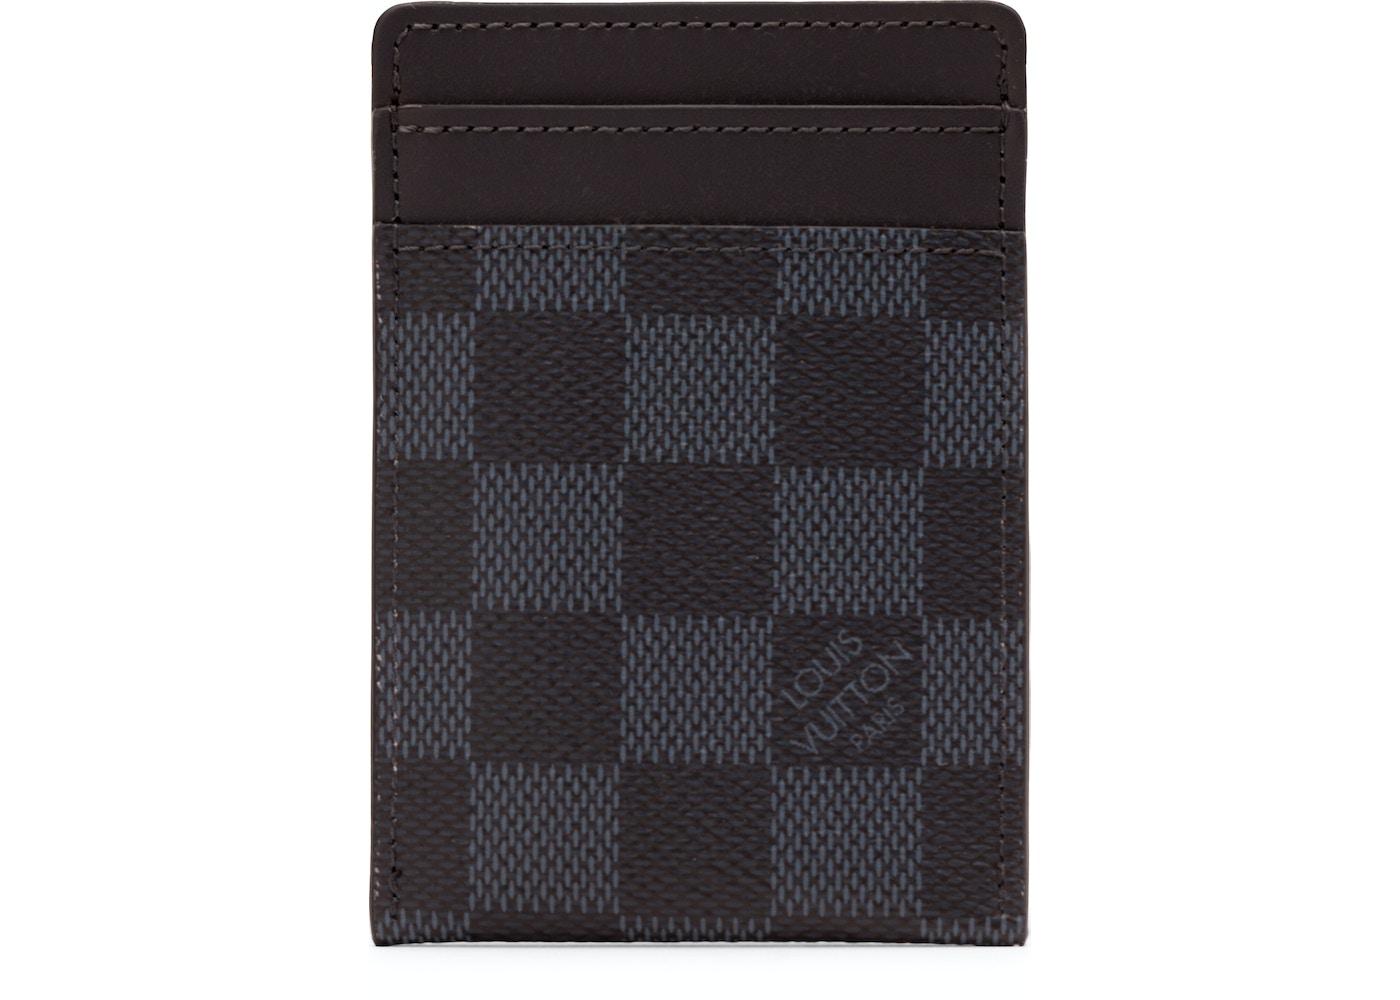 8ba59331dbcf Louis Vuitton Card Holder Neo Porte Cartes Damier Cobalt Blue Black. Damier  Cobalt Blue Black